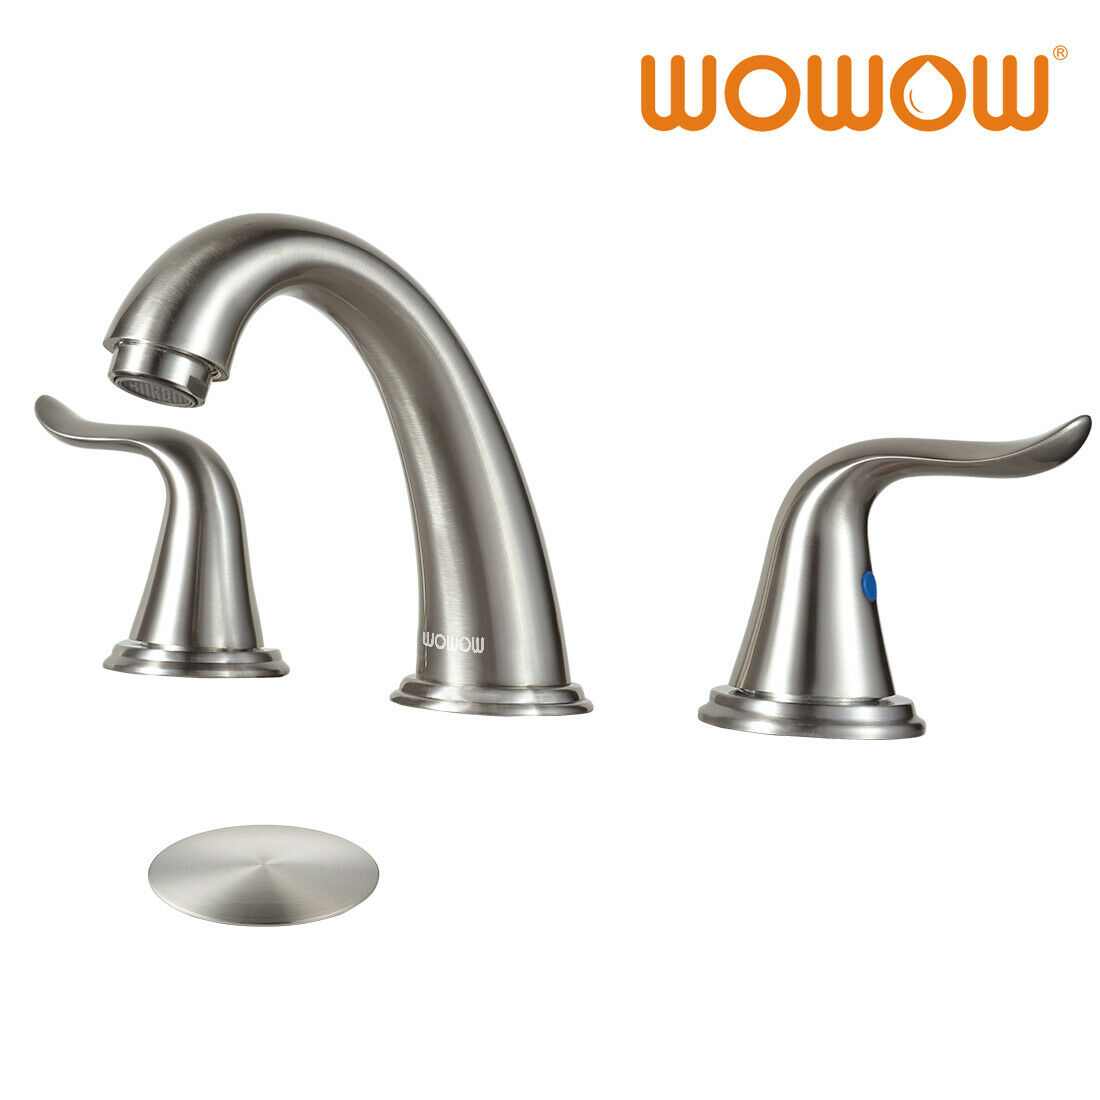 bathroom sink faucet 3 holes w/ overflow popup drain brushed nickel  widespread